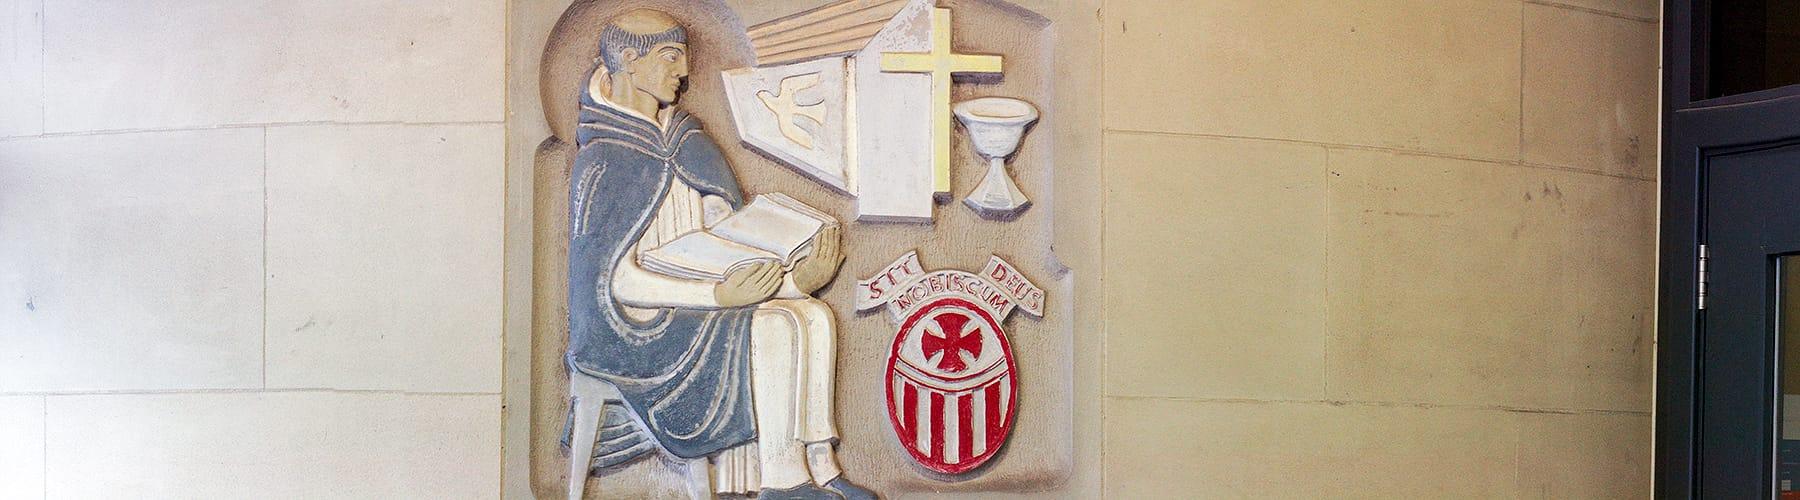 St Thomas of Aquin's RC High School